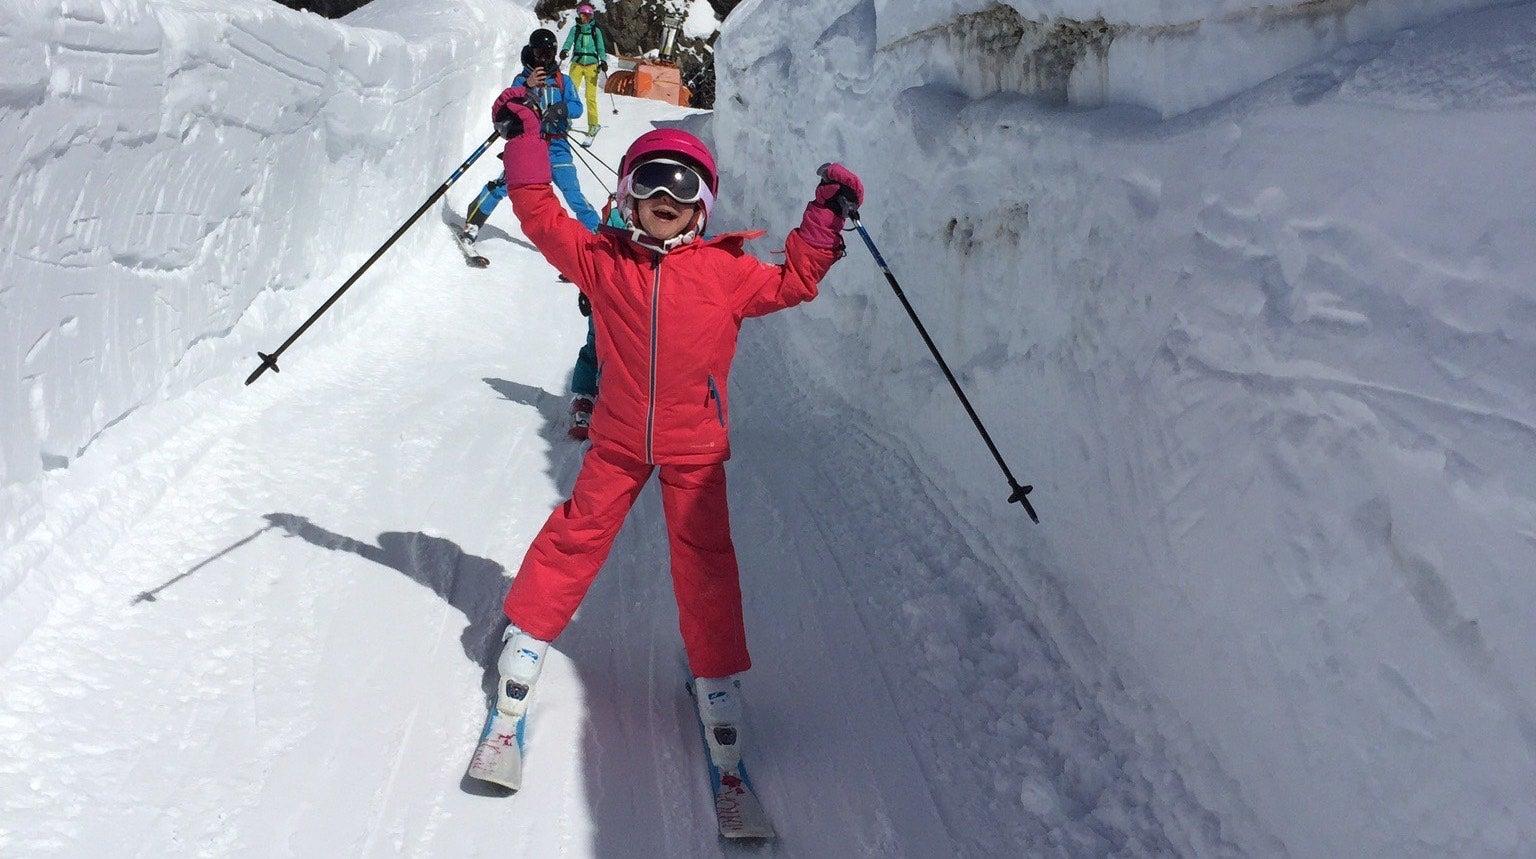 Should Your Kid Be In Ski School?